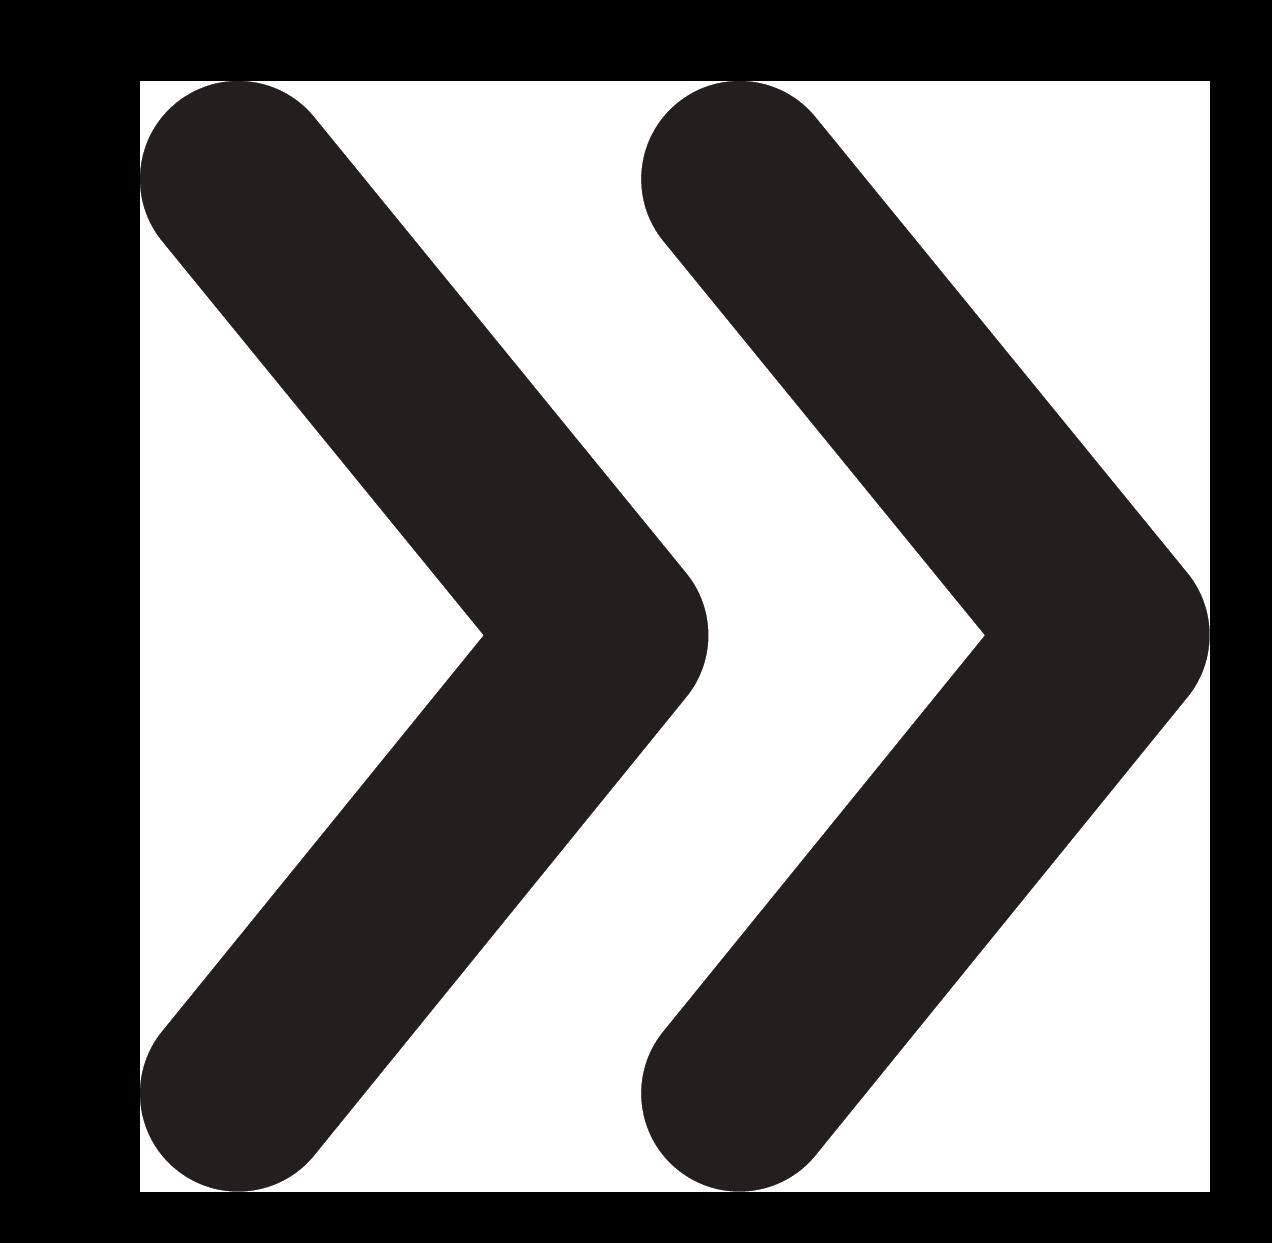 double-right-arrow-transparent